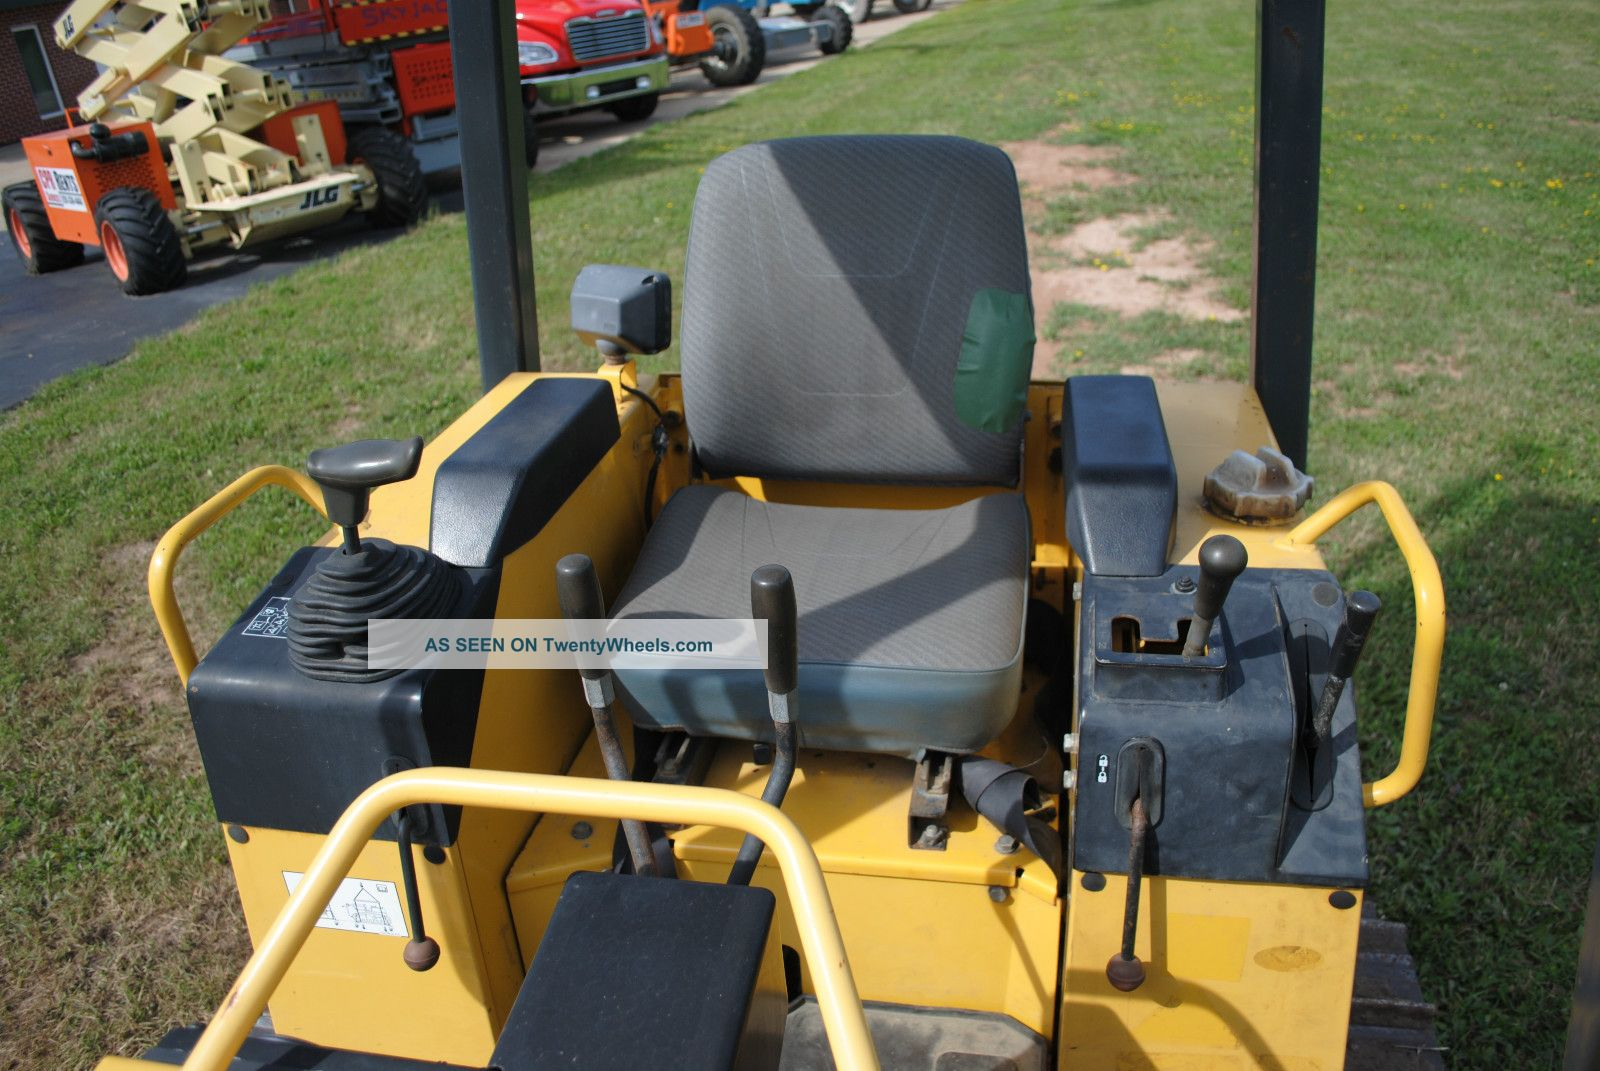 2005 Komatsu Dozer Model: D21a Crawler Bulldozer Very 800 Hours